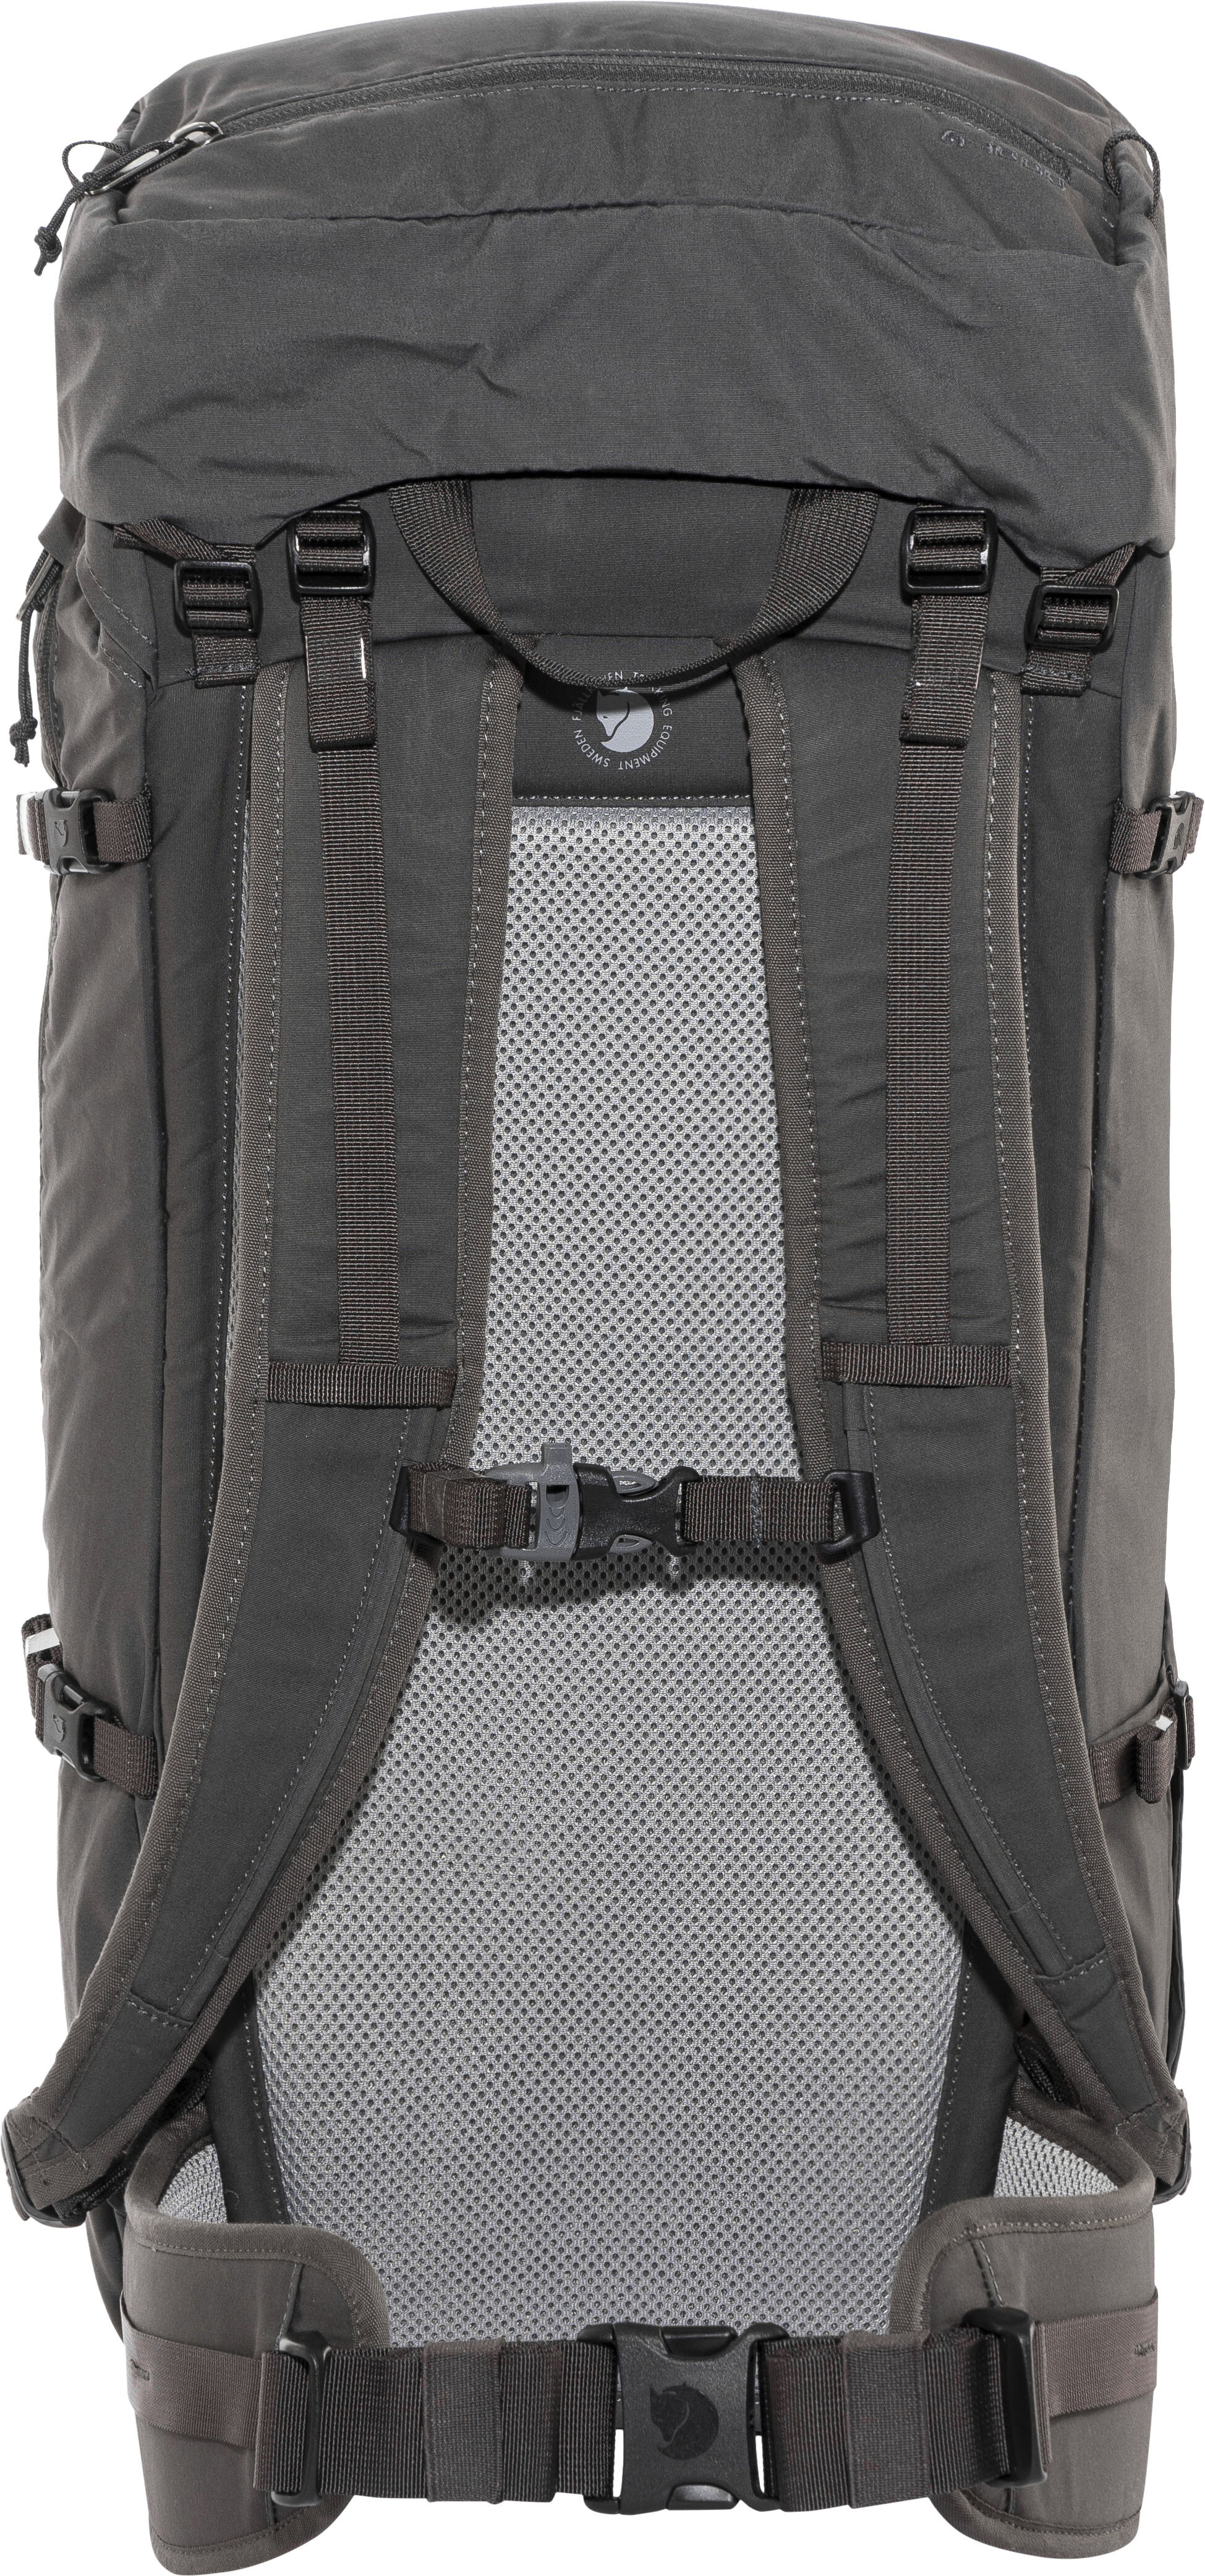 Fjällräven Abisko Hike 35 Backpack grey at Addnature.co.uk 38f44f99325a3